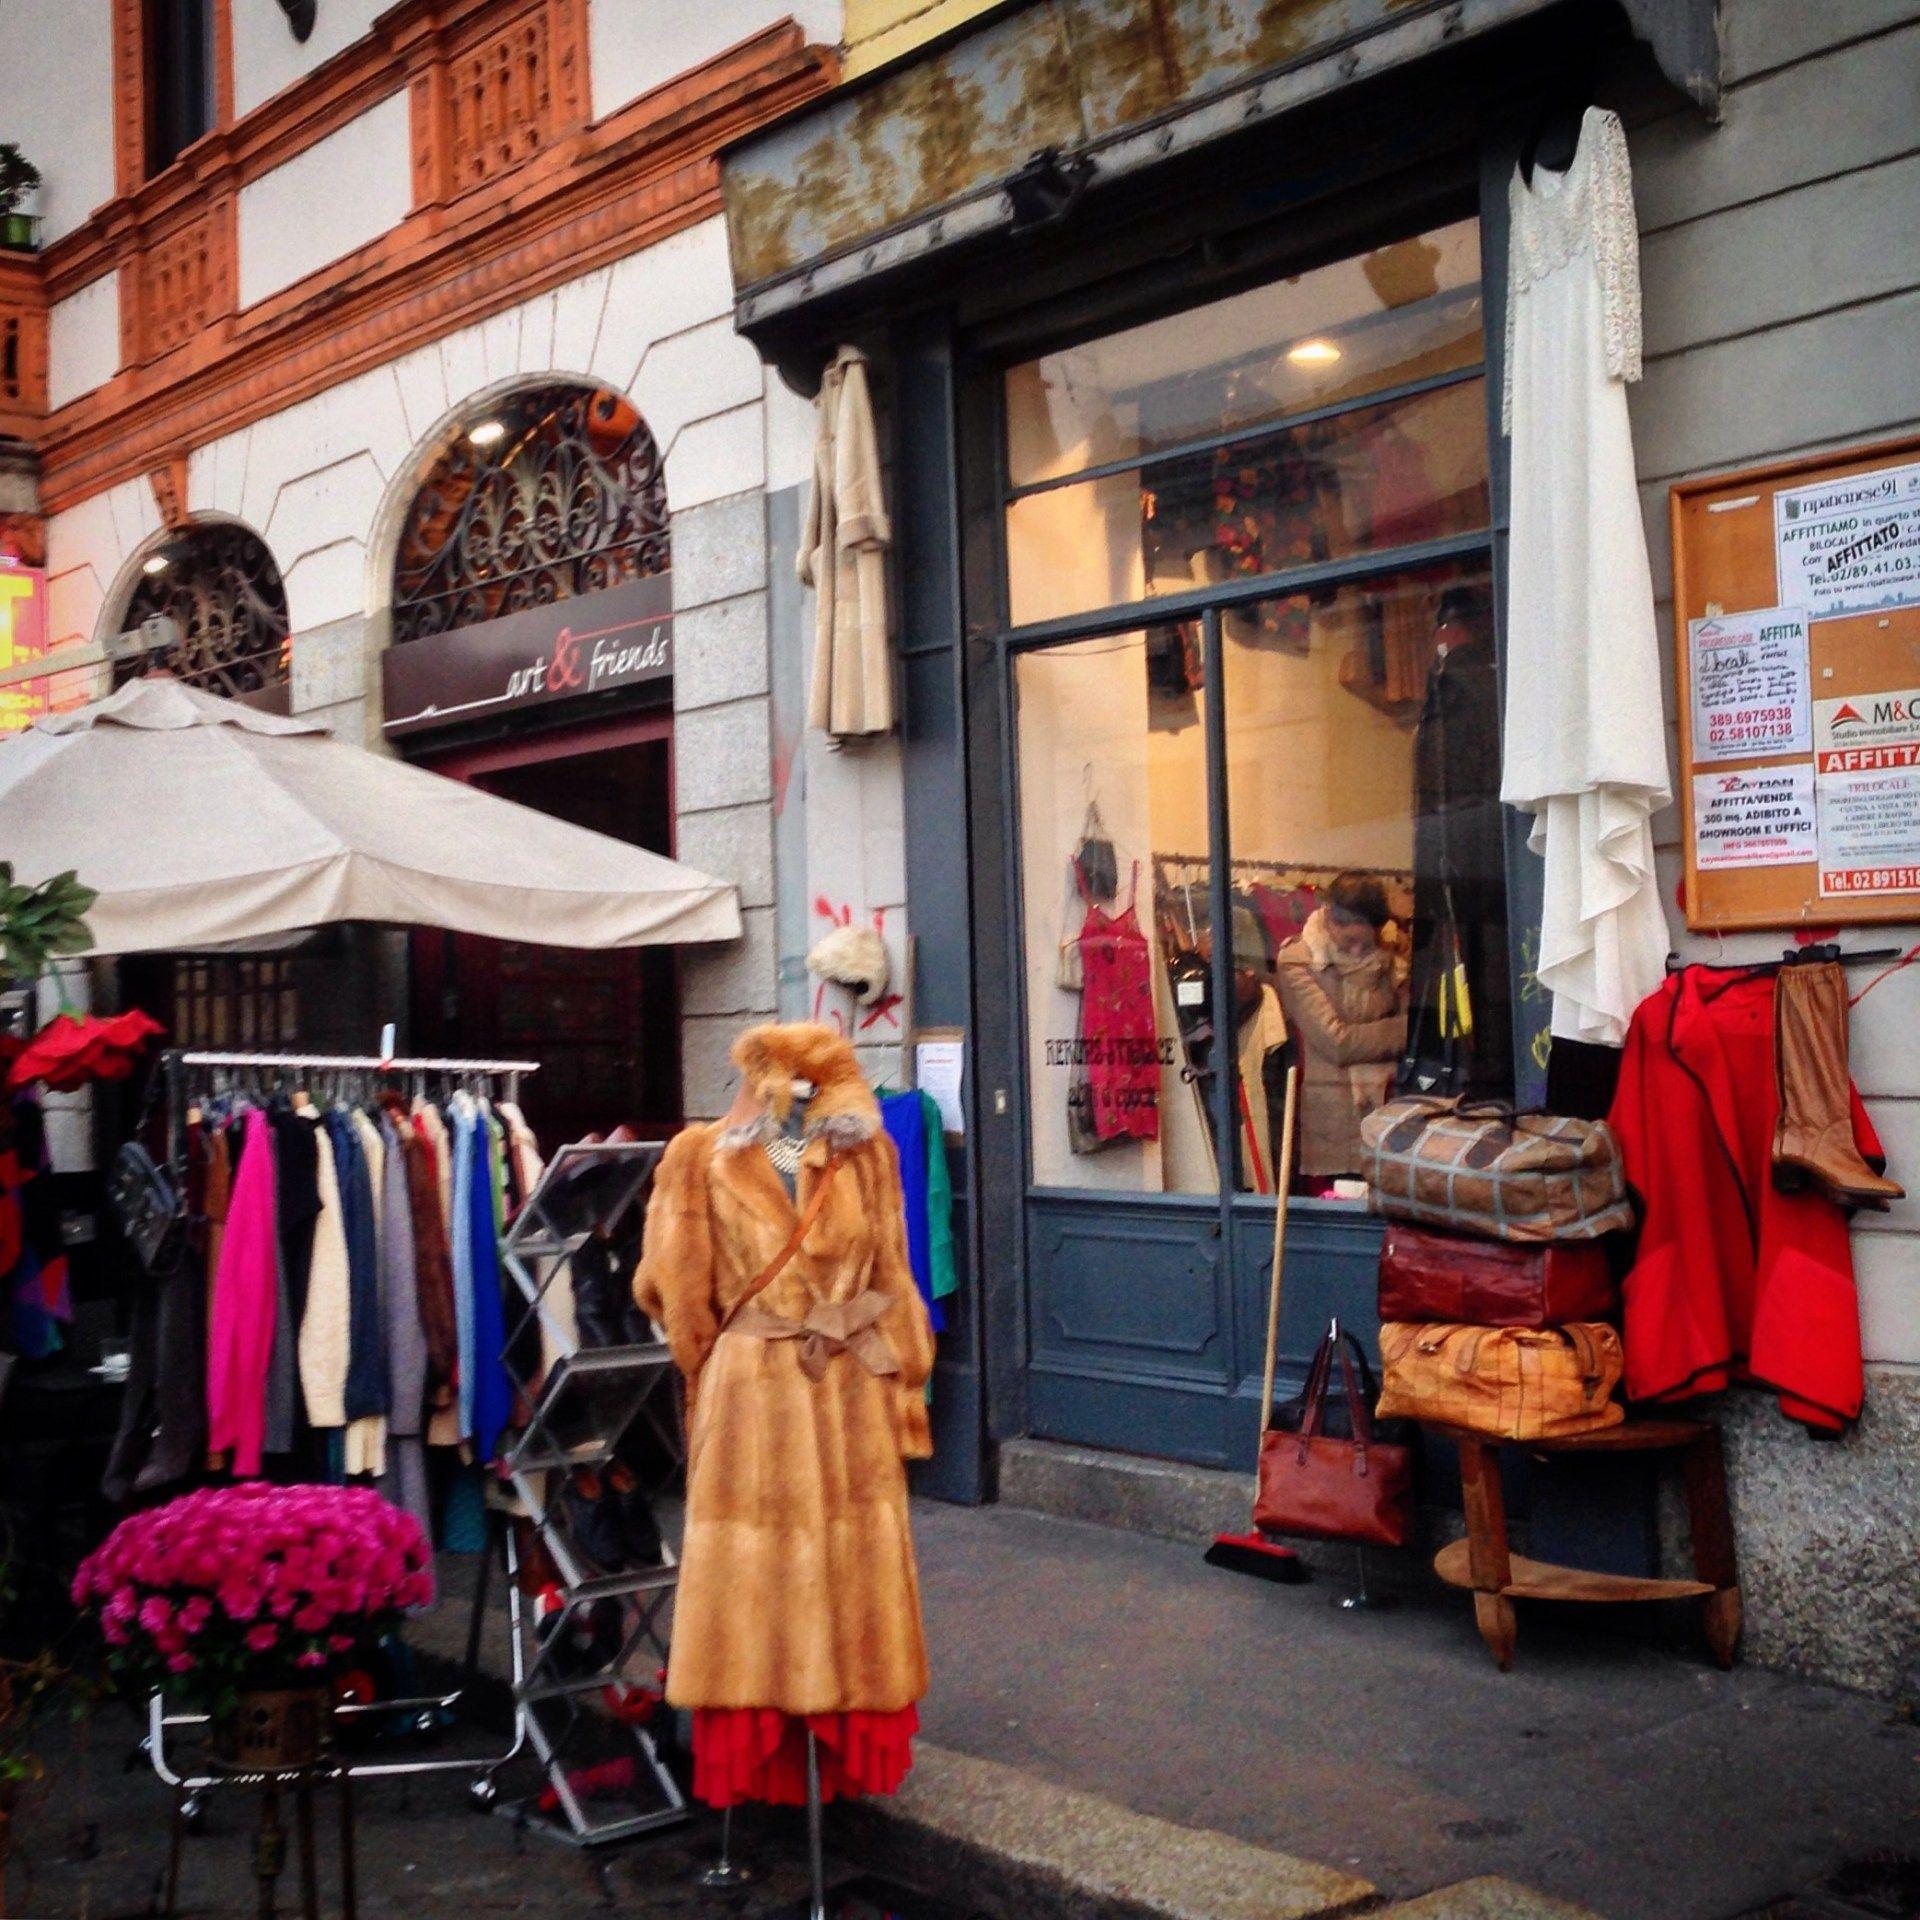 Vintage Clothing Shop In The Navigli Vintage Clothes Shop Milan Navigli Milan